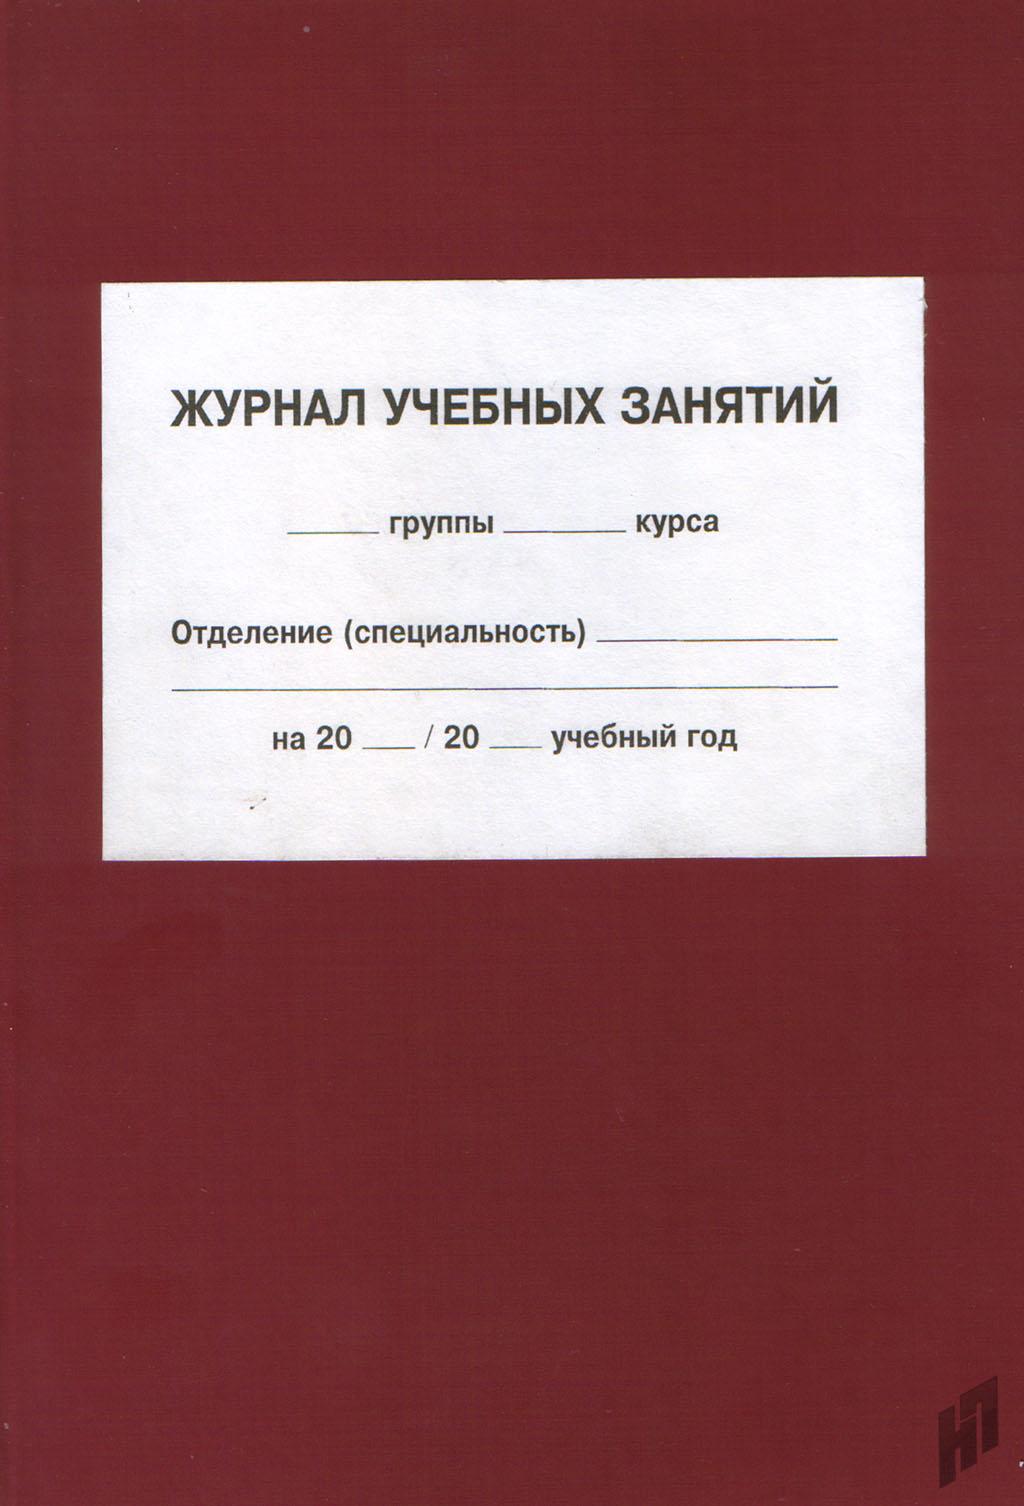 журнал по охране труда и технике безопасности в спо